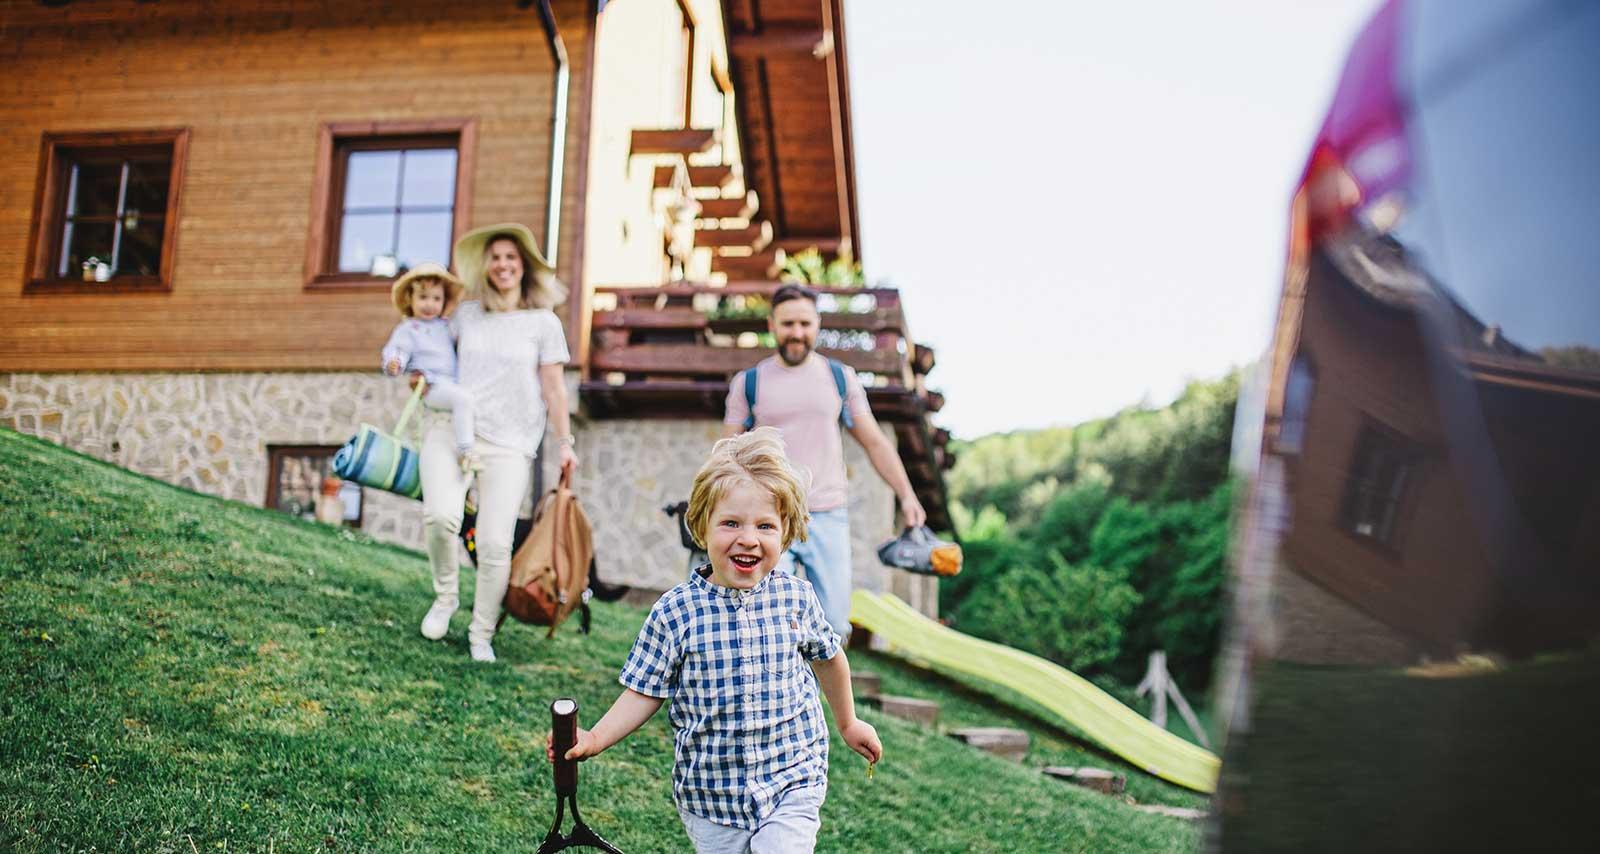 Familie auf Reise mit dem all-inclusive Auto-Abo.